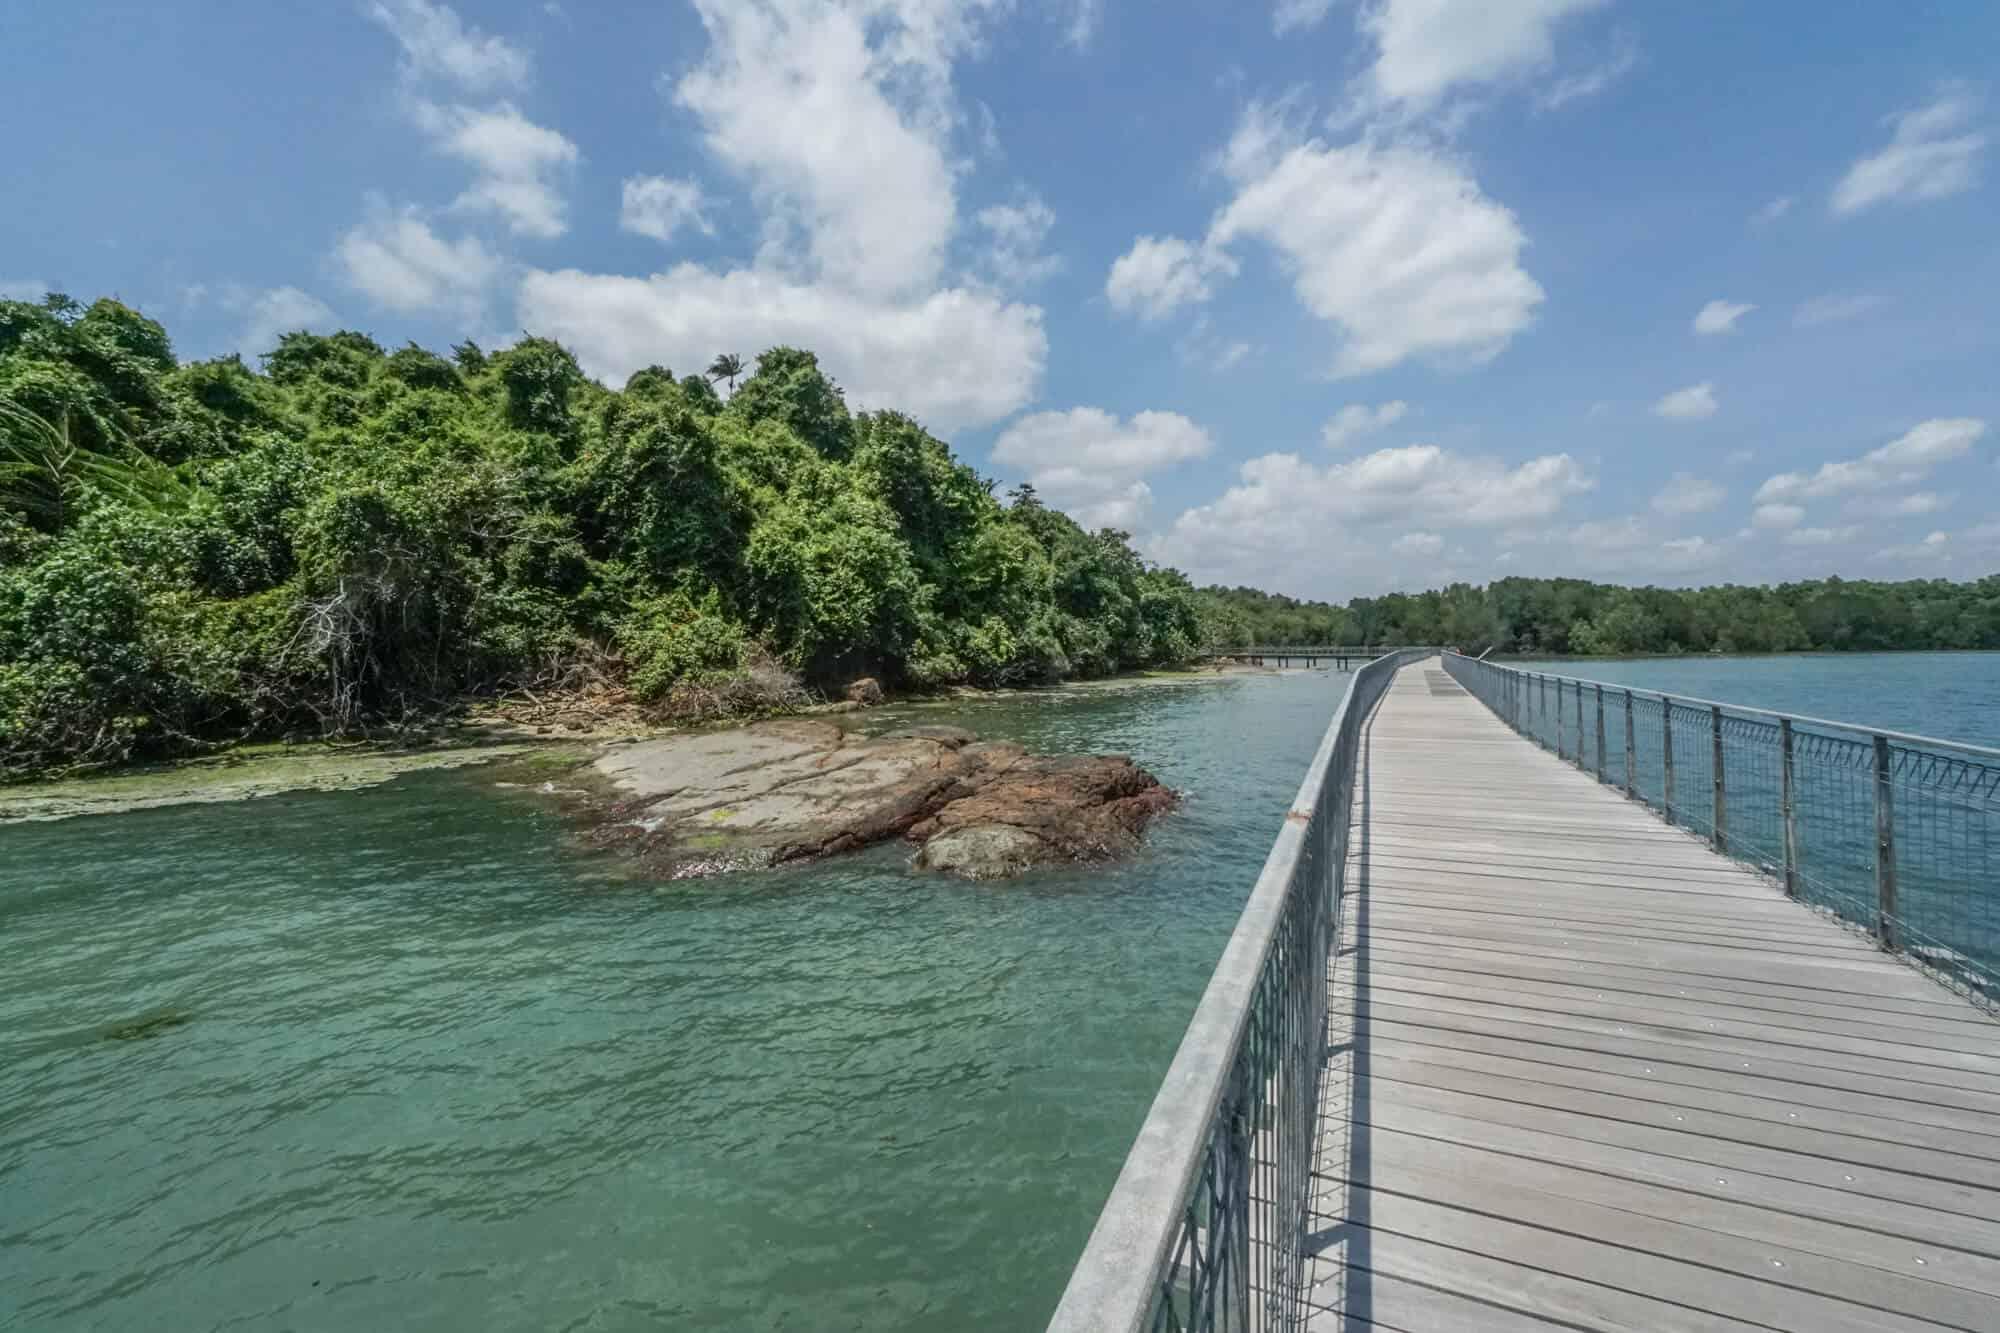 Pulau Ubin Check Jawa Wetlands Boardwalk